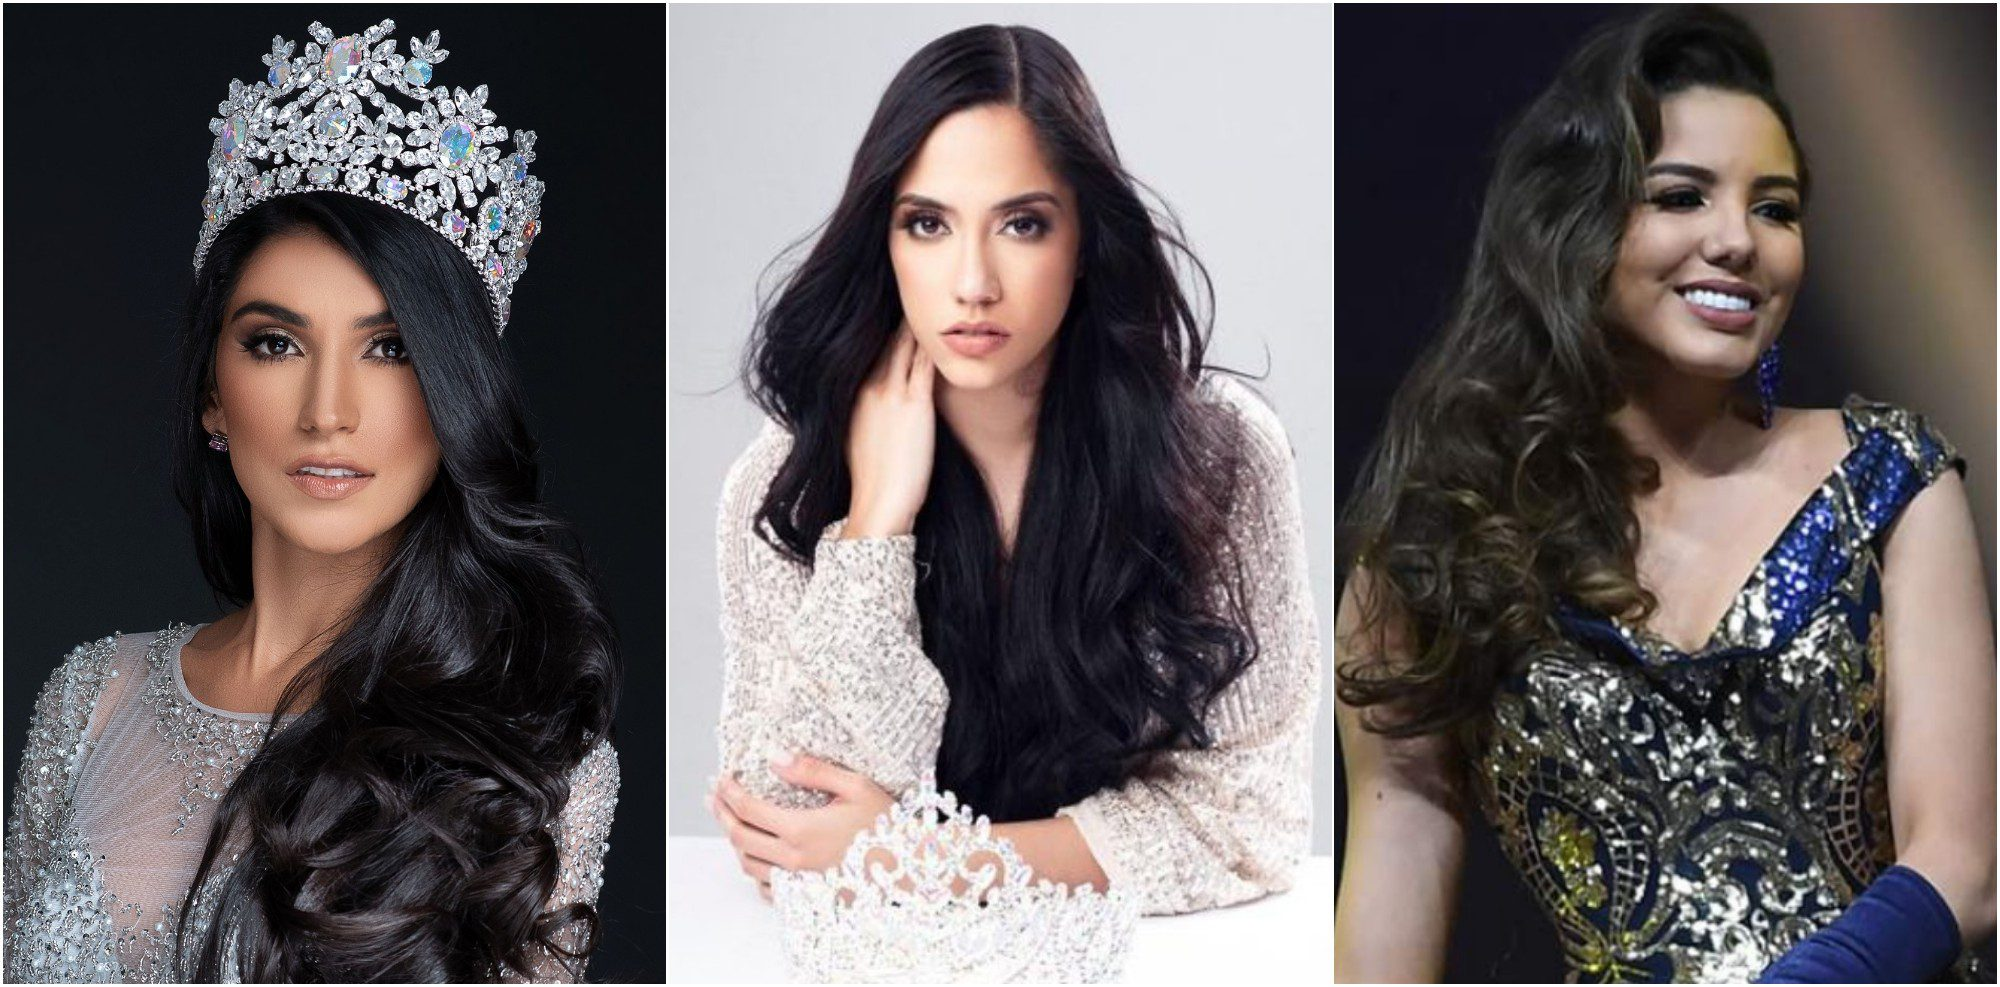 Miss Honduras Universo 2021 se llevará a cabo en agosto